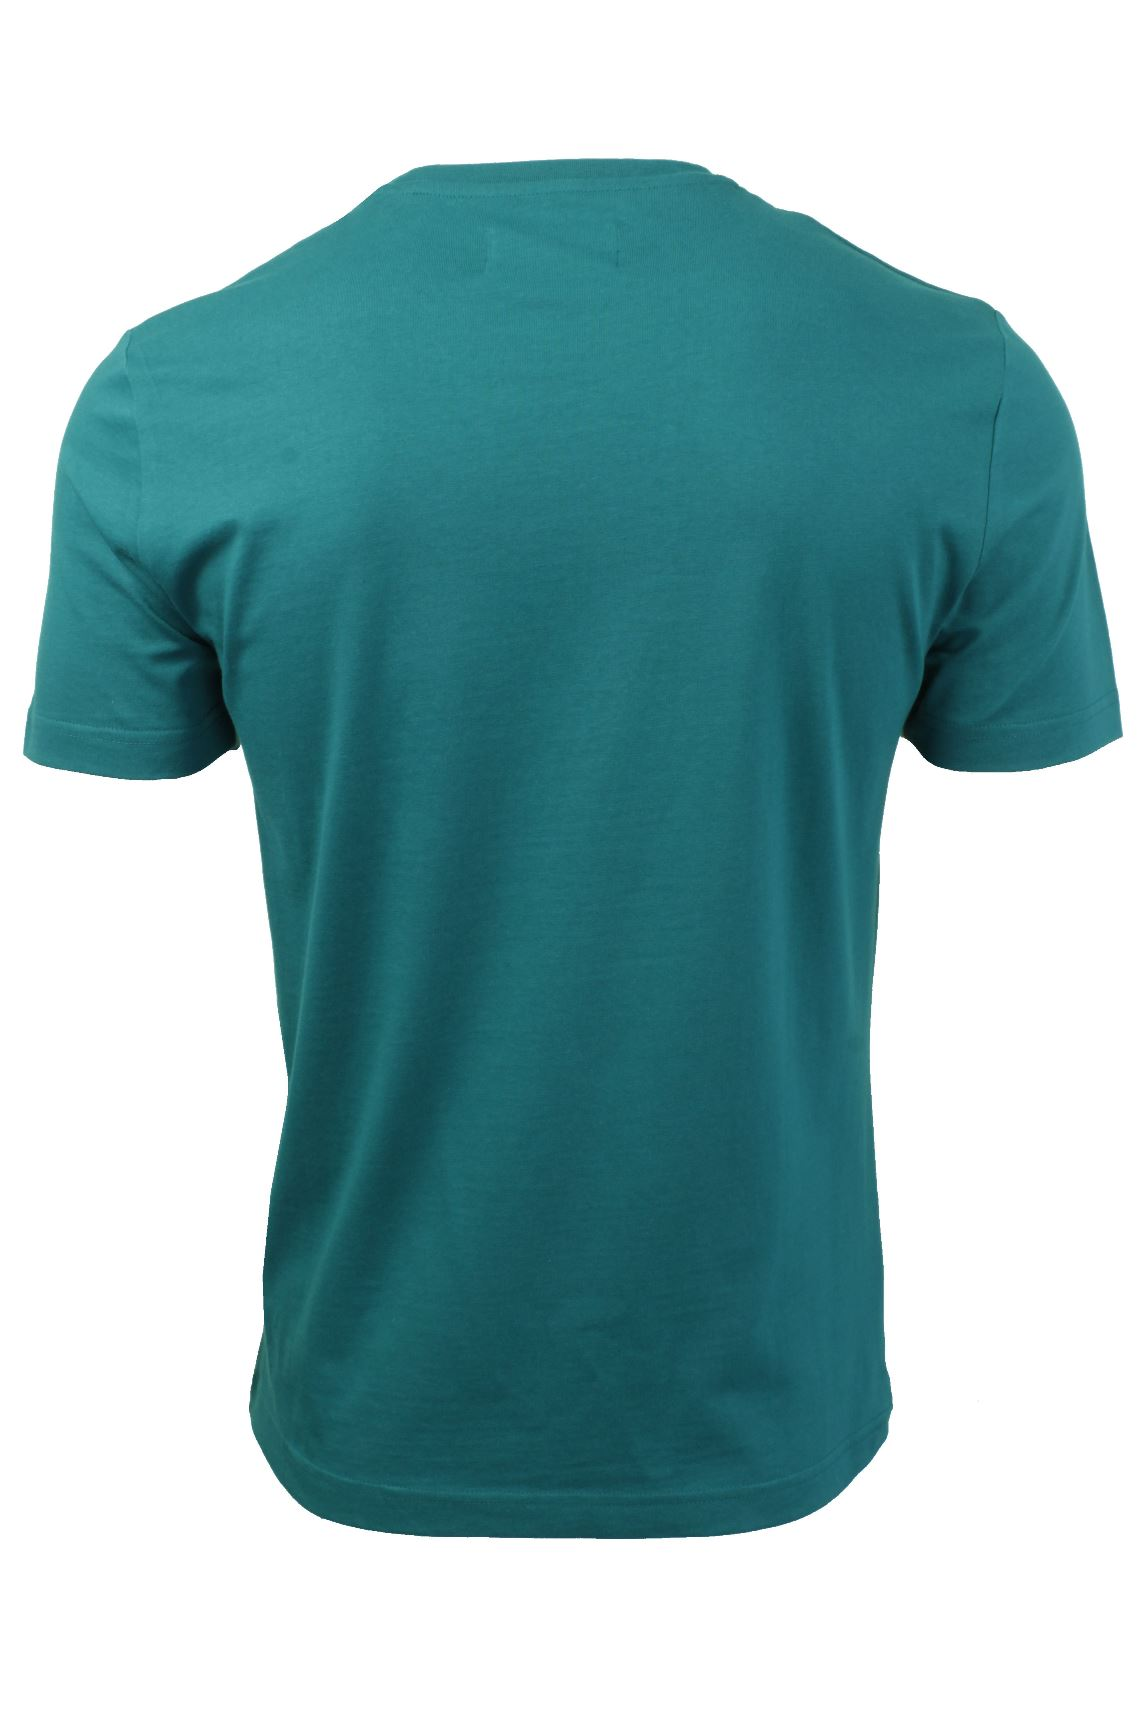 Mens-T-Shirt-by-Original-Penguin-Crew-Neck-Short-Sleeved thumbnail 20